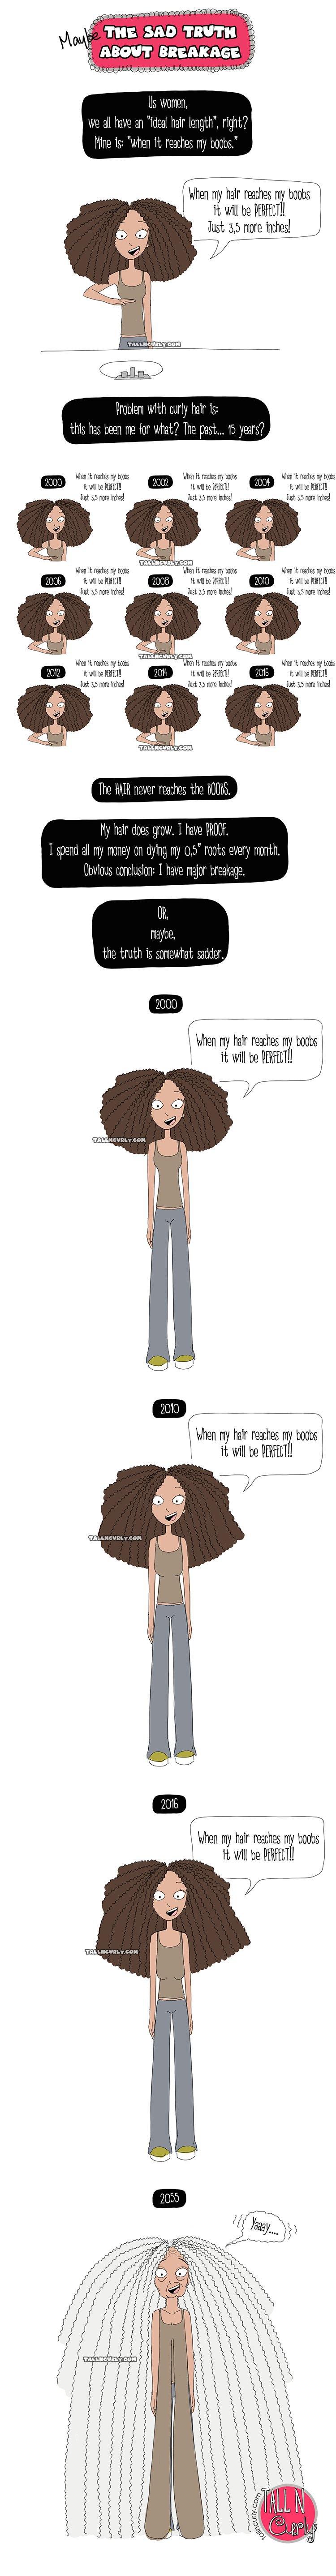 Tall N Curly - Breakage